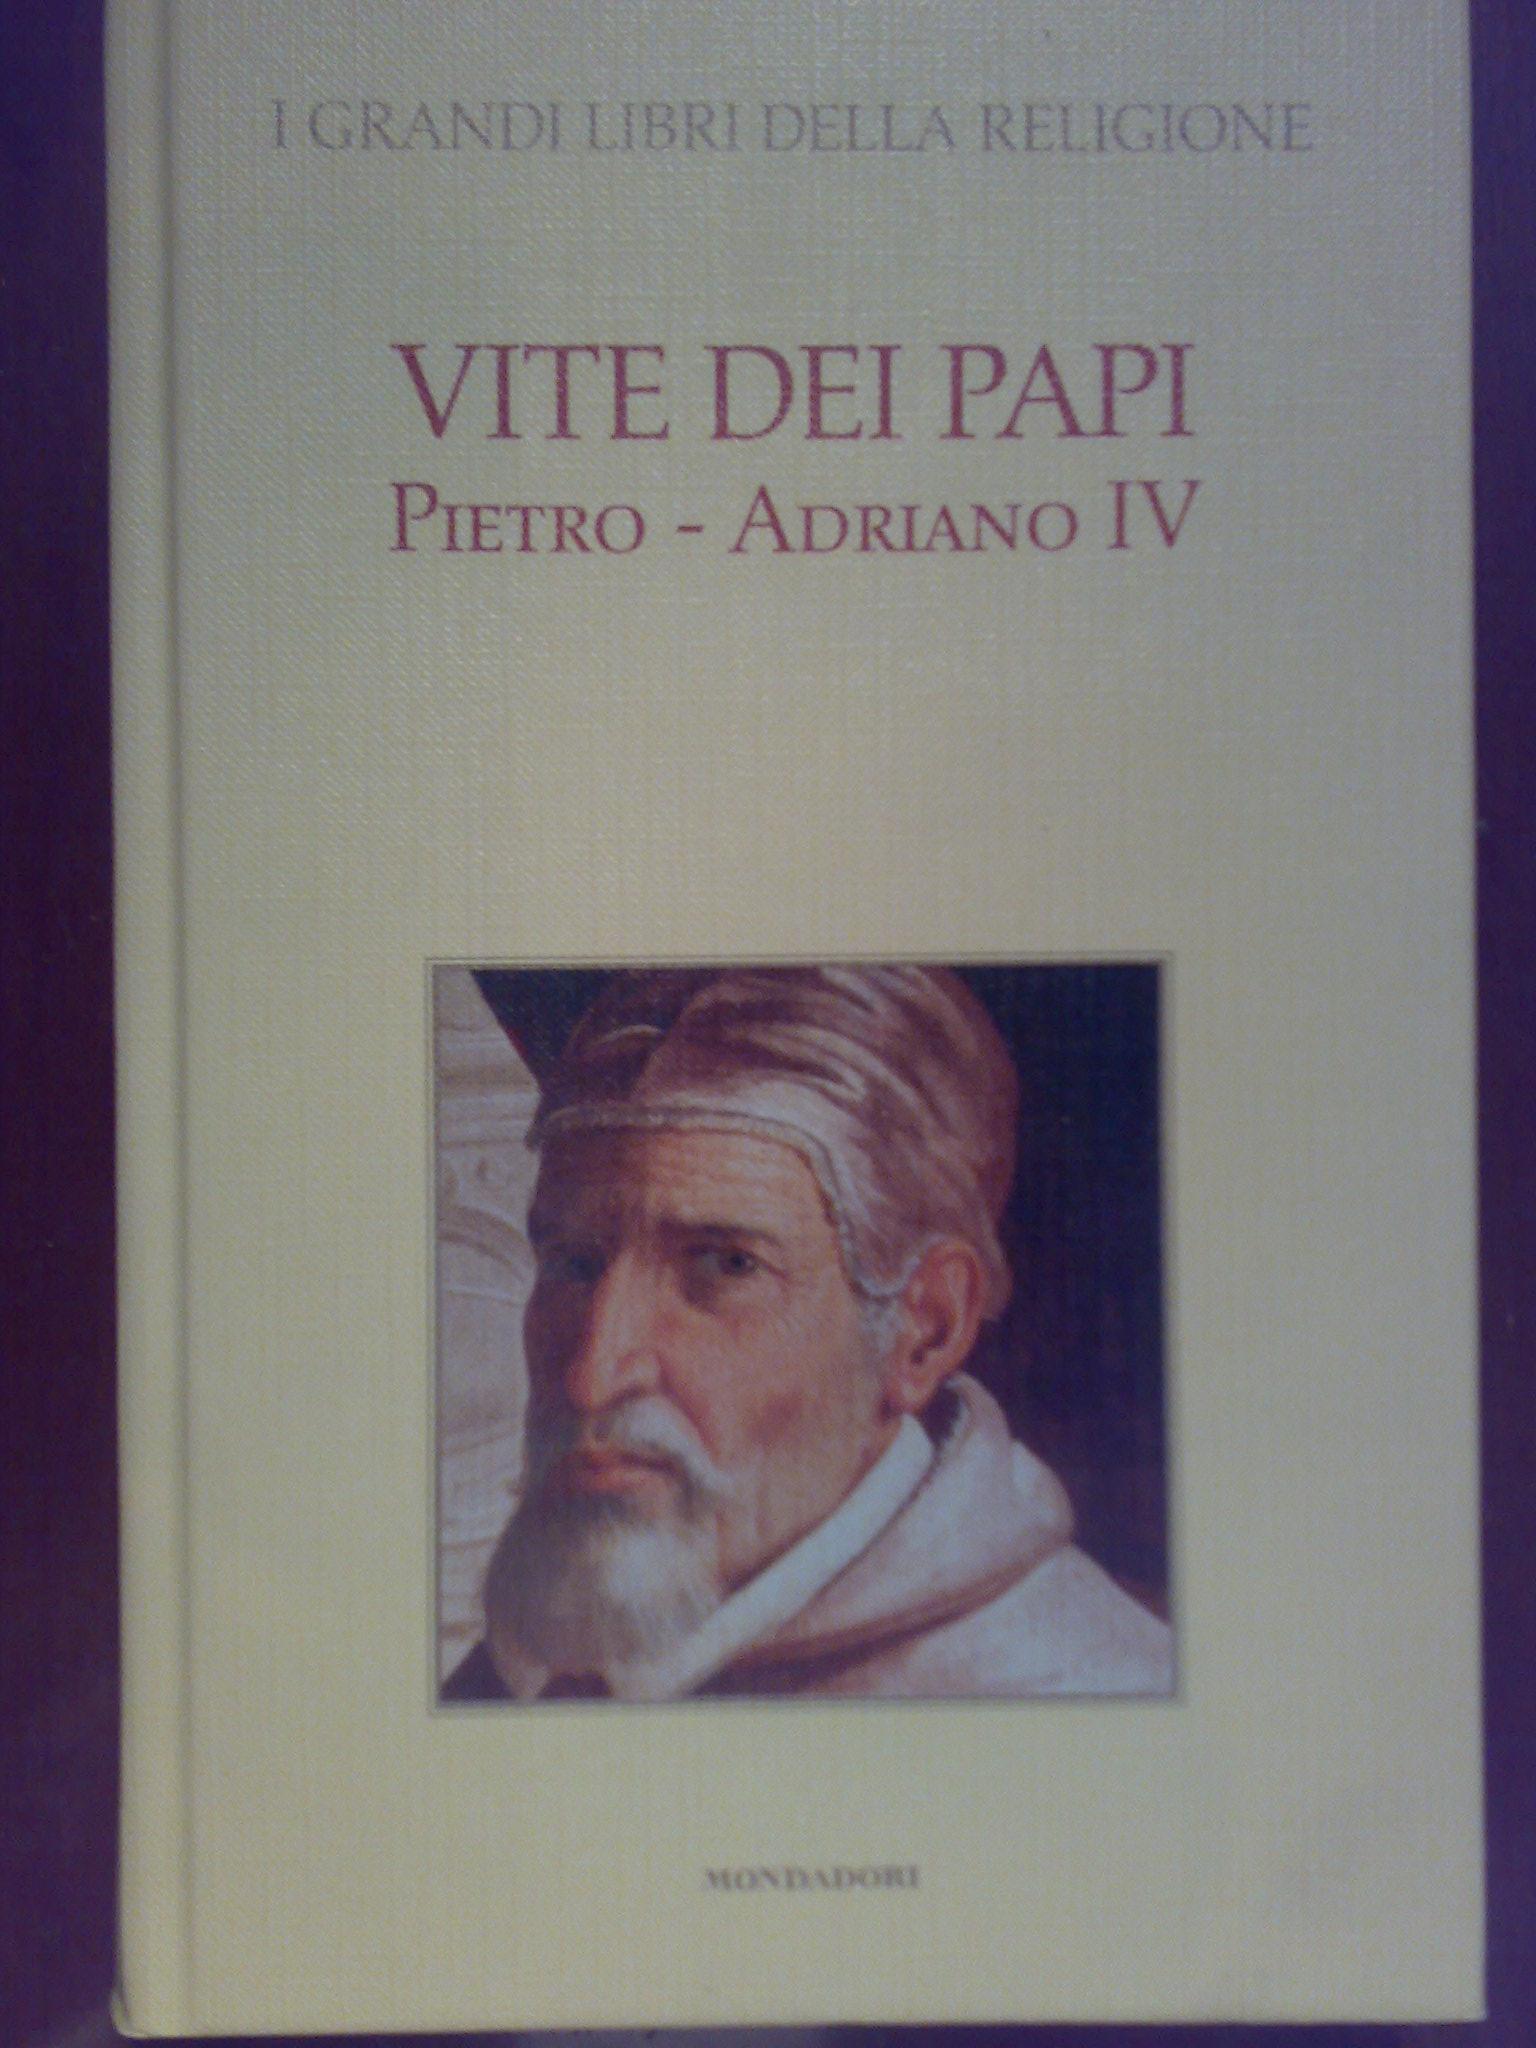 Vite dei papi (Pietro - Adriano IV)